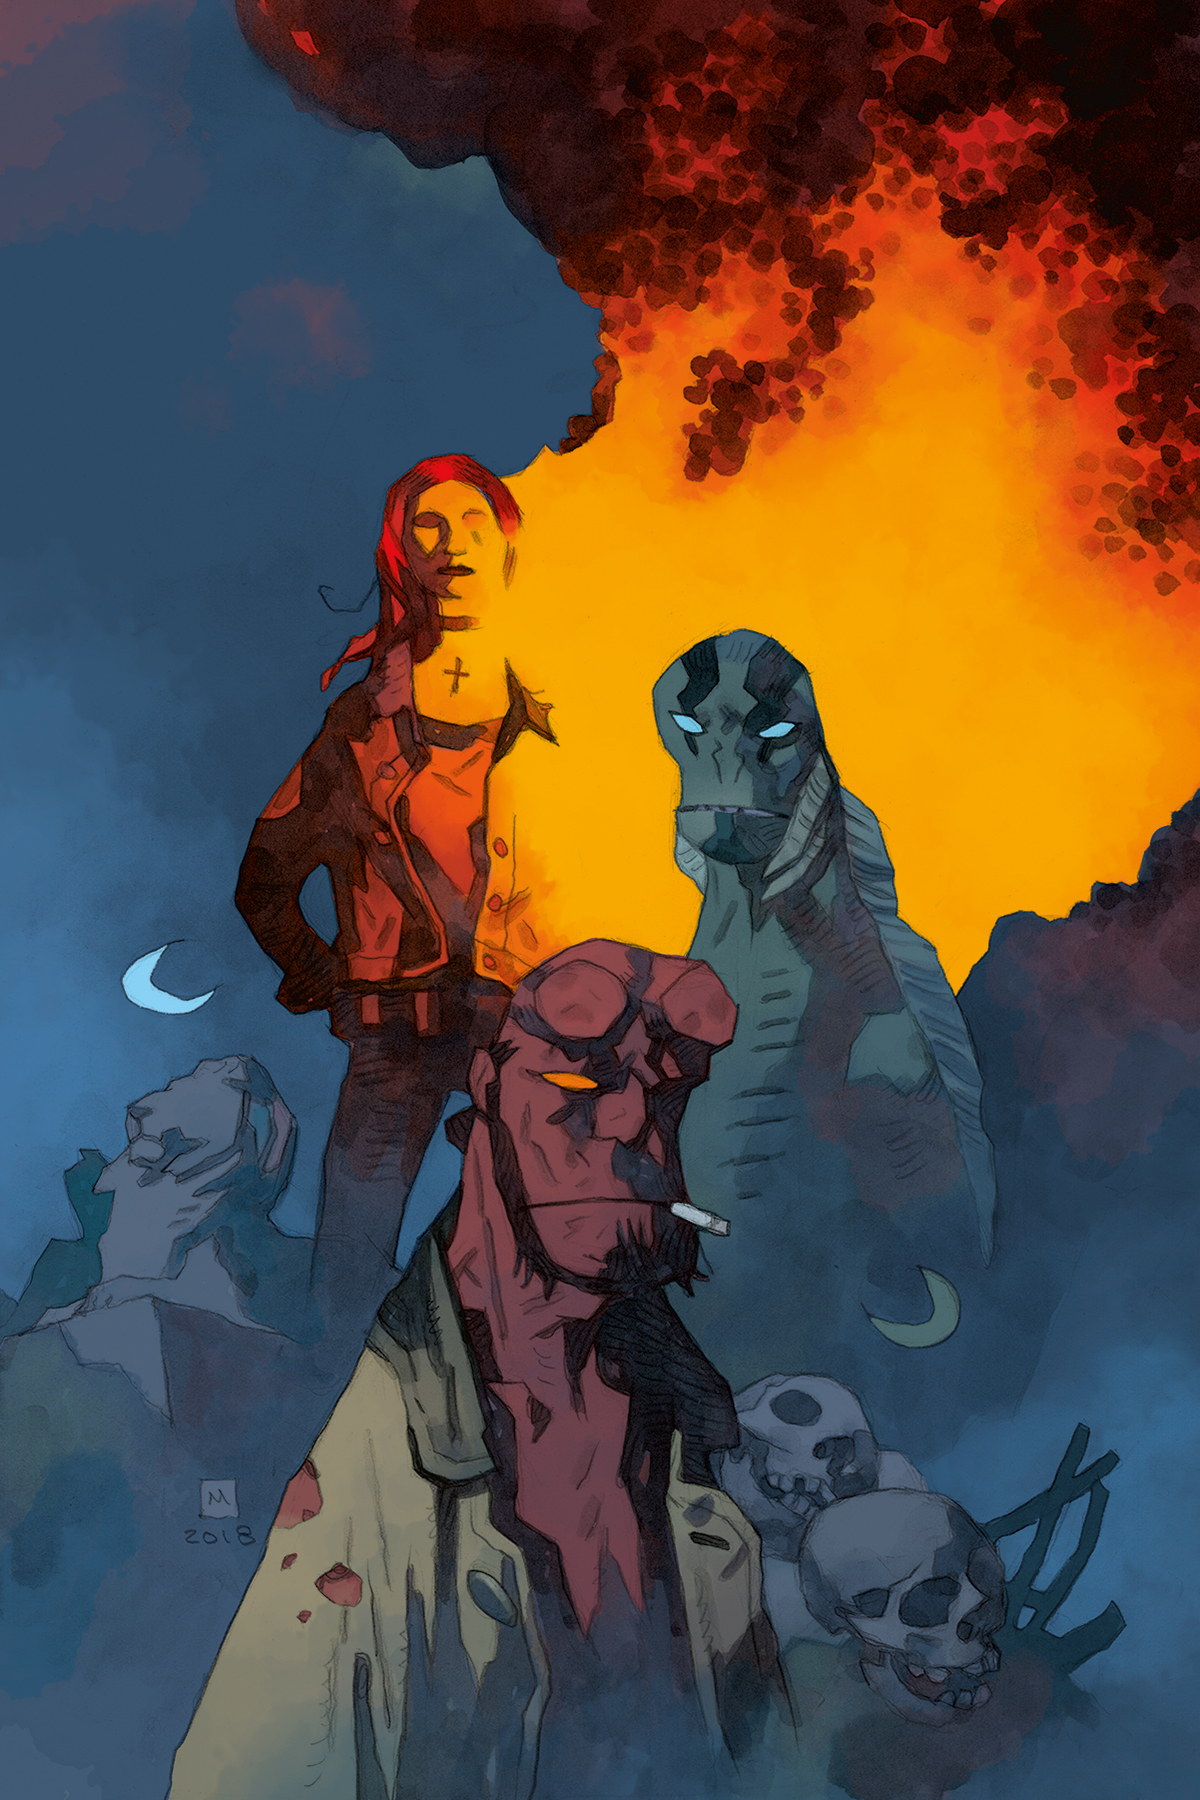 bab3795794fca Ragna Rok (story arc) | Hellboy Wiki | FANDOM powered by Wikia